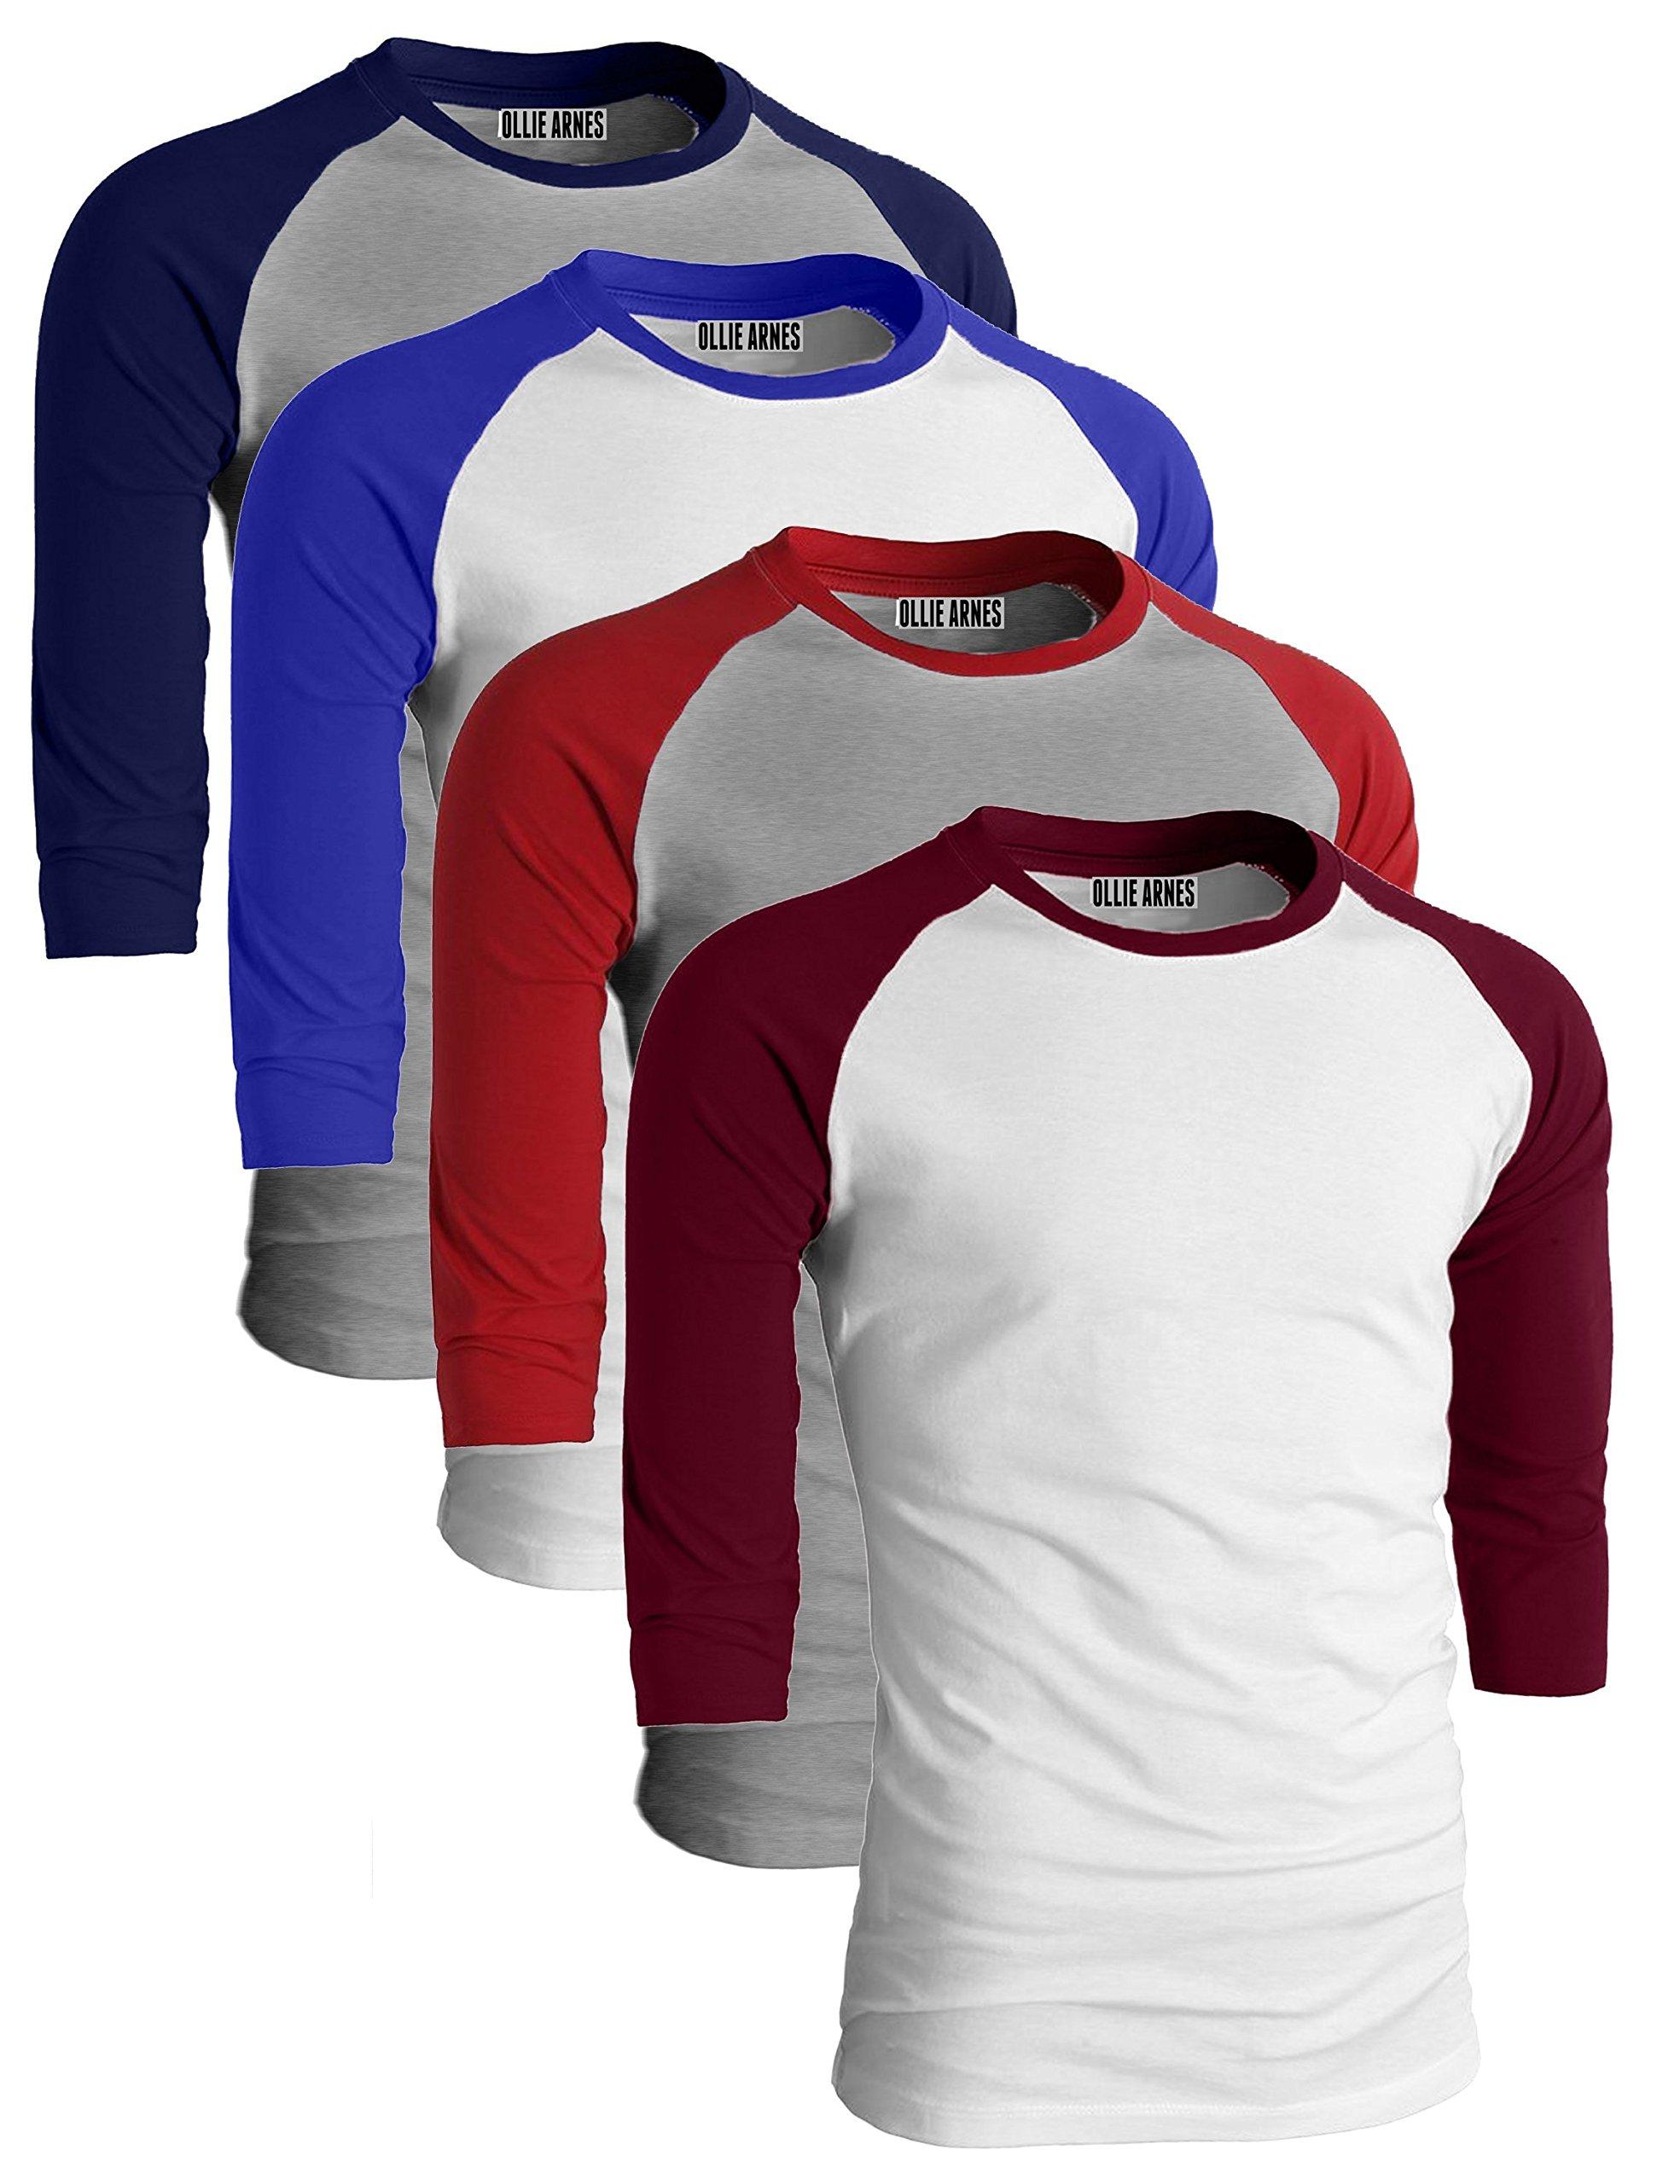 Ollie Arnes Men's Basic Crewneck 3/4 Sleeve Cotton